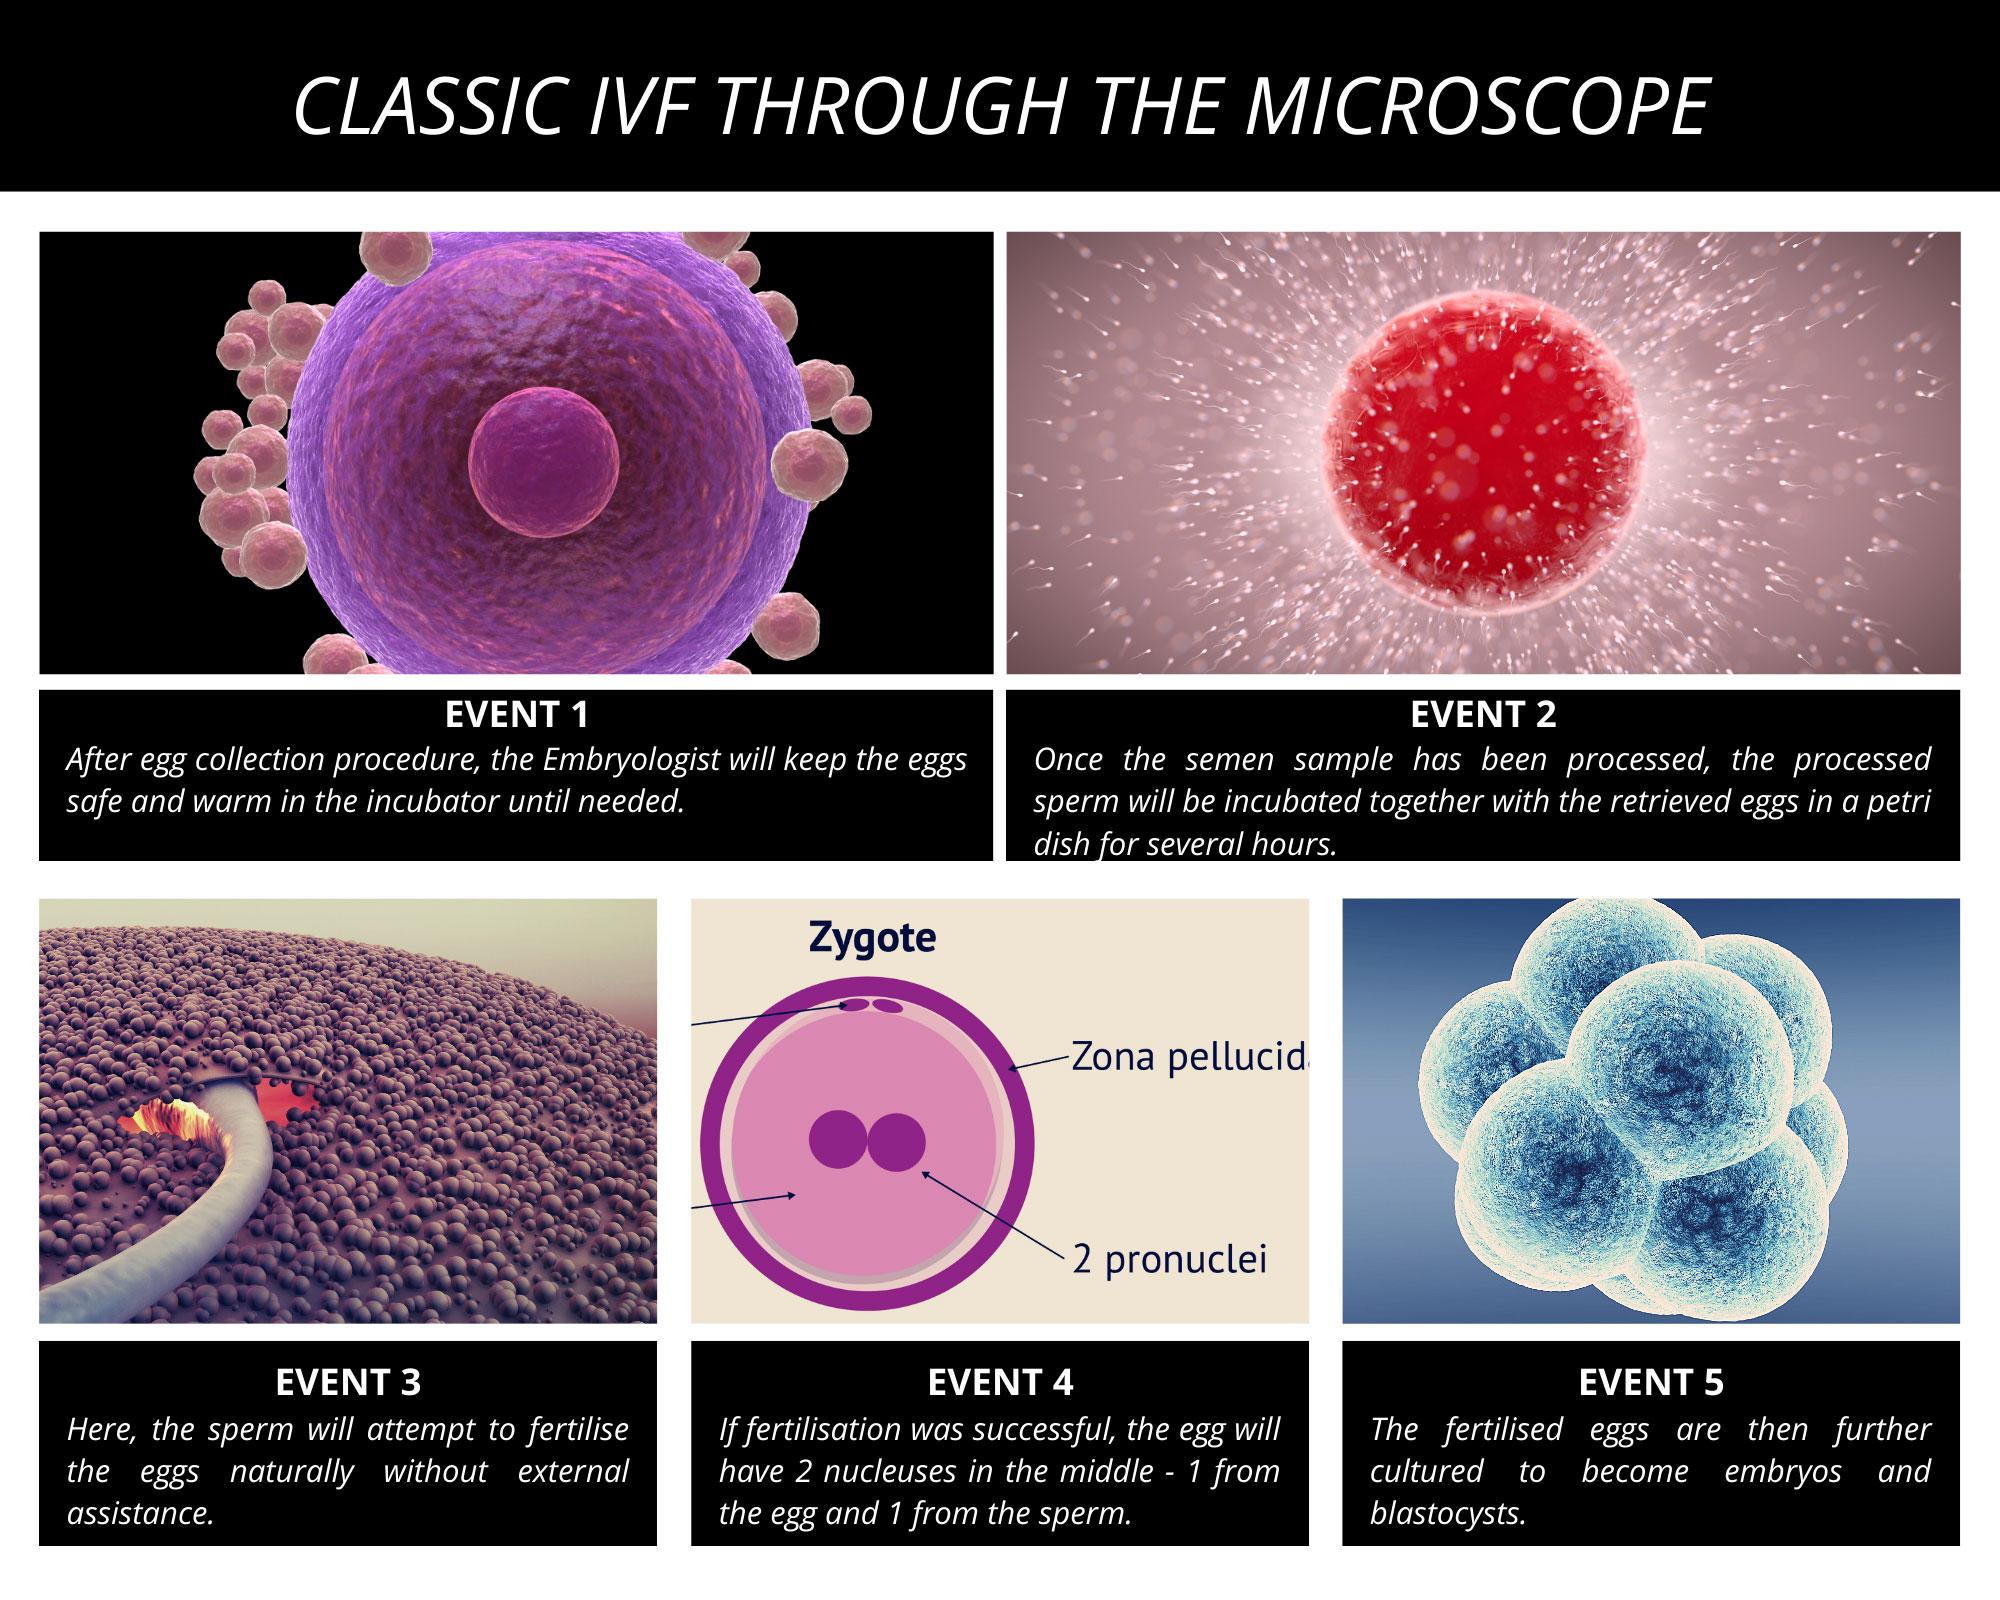 Classic-IVF-Through-The-Microscope